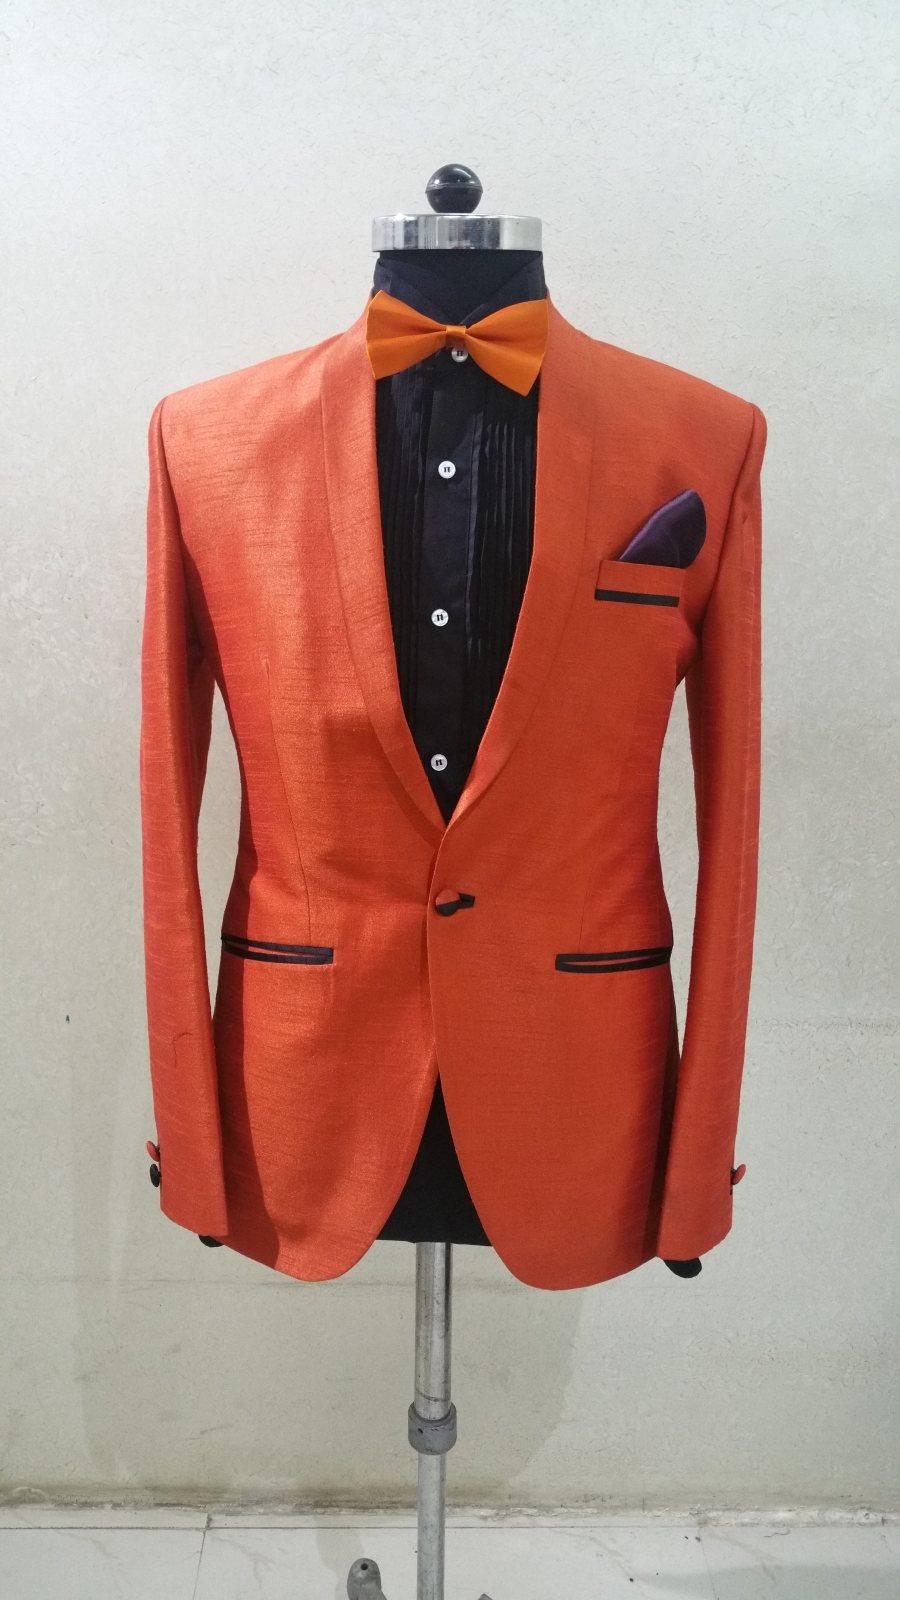 designer tuxedo Price Rs 7000/- offer Price 5000/-